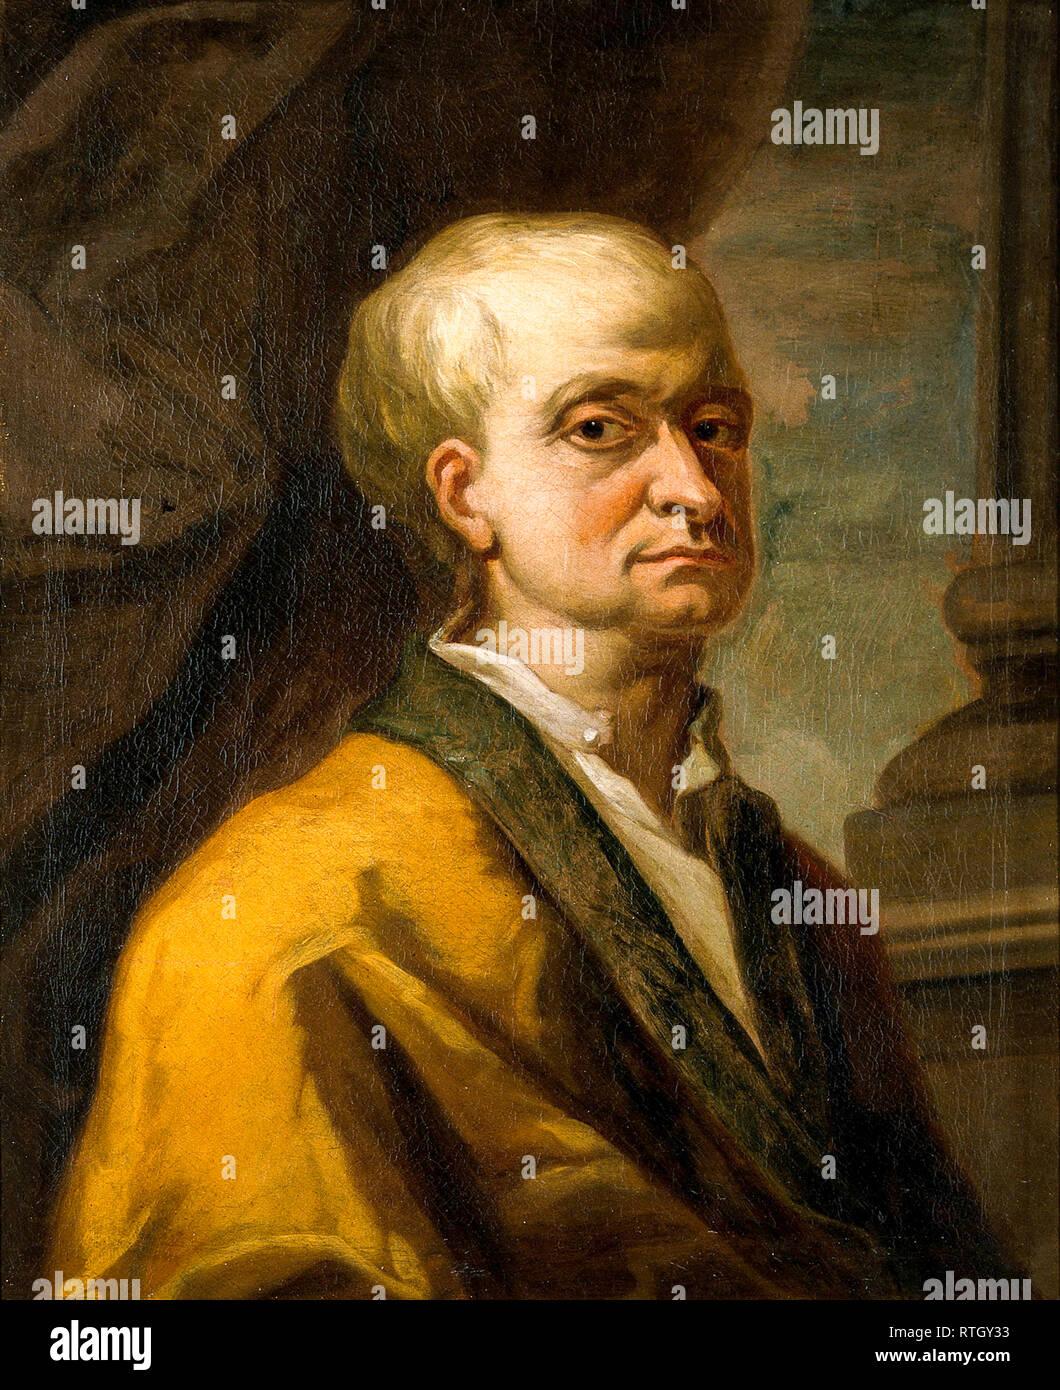 Sir Isaac Newton (1642-1727), portrait painting - Stock Image